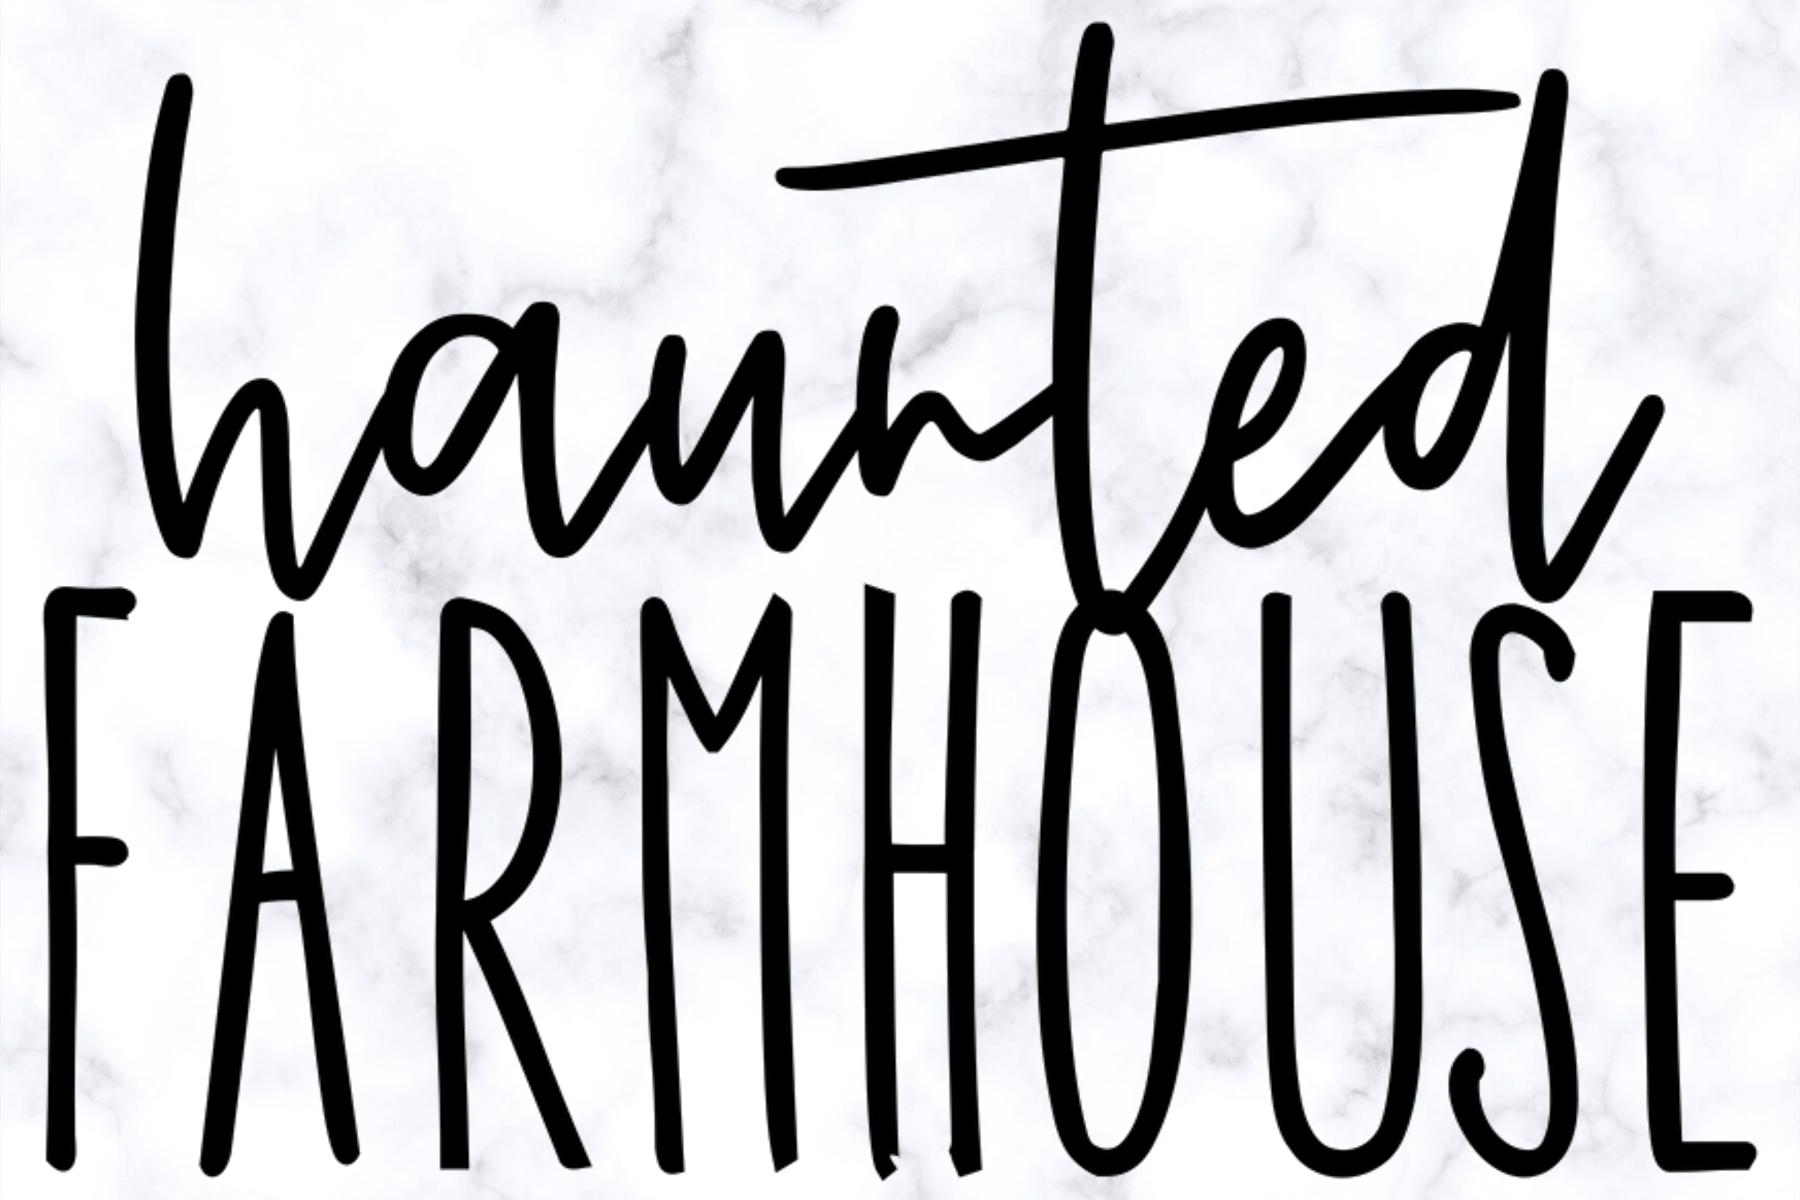 Haunted Farmhouse SVG |Halloween SVG Sign Digital Cut File example image 3